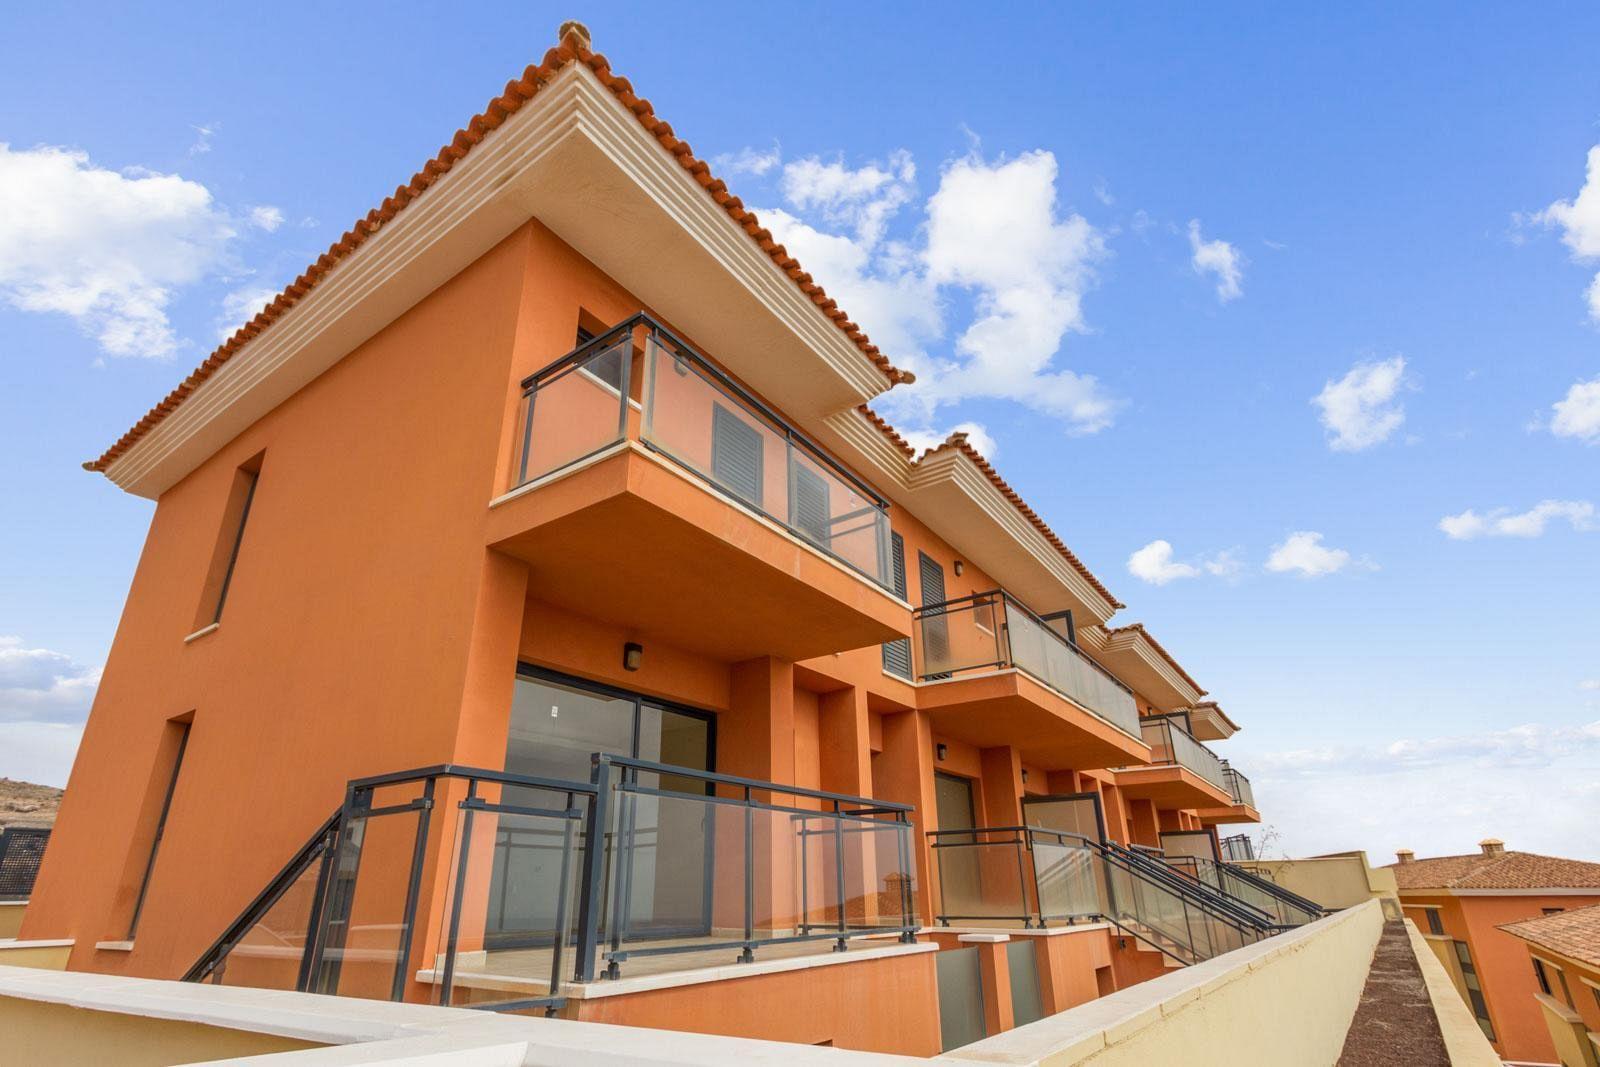 TOWNHOUSE IN THE ATALAYA PARK RESIDENTIAL IN CALETA DE FUSTE – FUERTEVENTURA